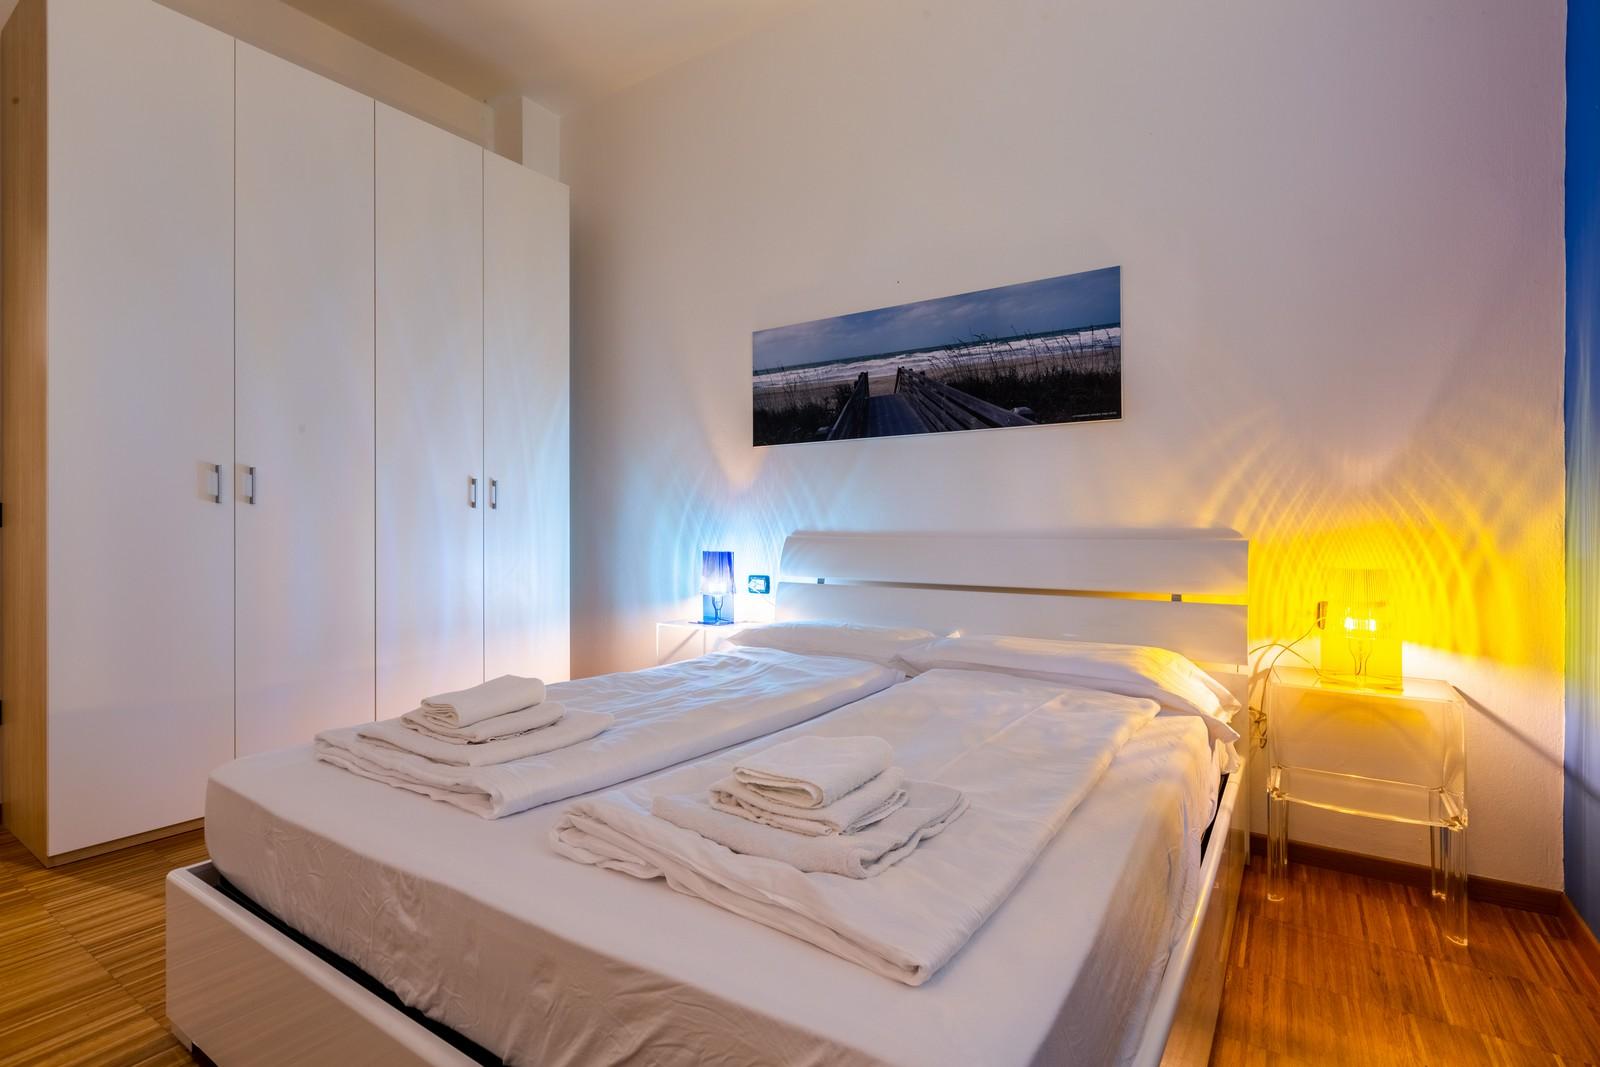 Apartment For 4 6 Persons Lake House La Gemma